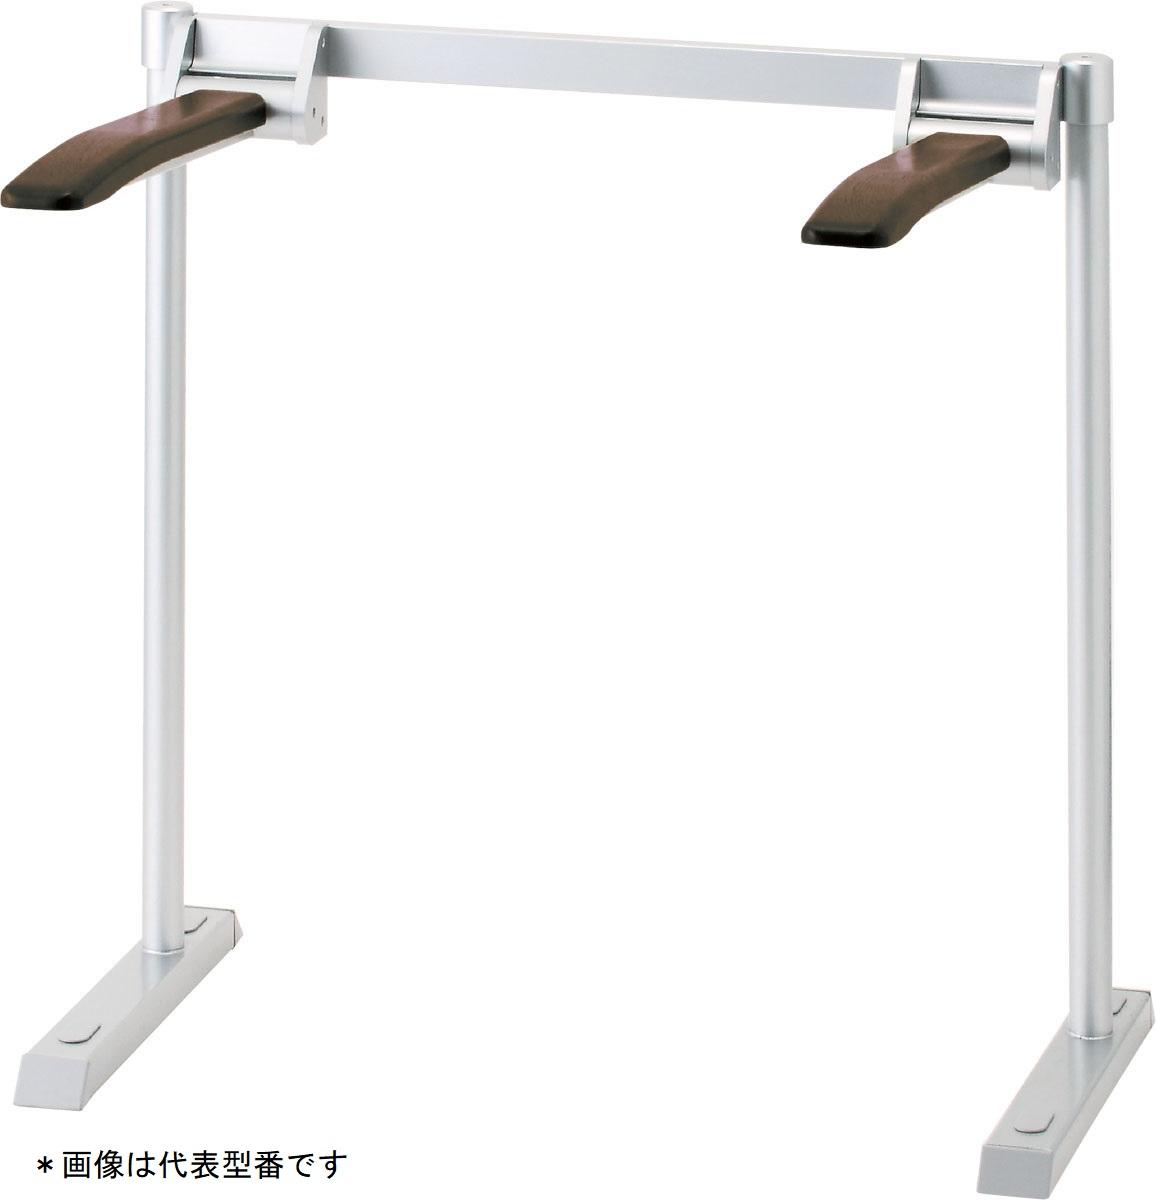 INAX/LIXIL【KFC-292KN】肘掛け手すり(床付式・背もたれなし)天然木タイプ パブリック用